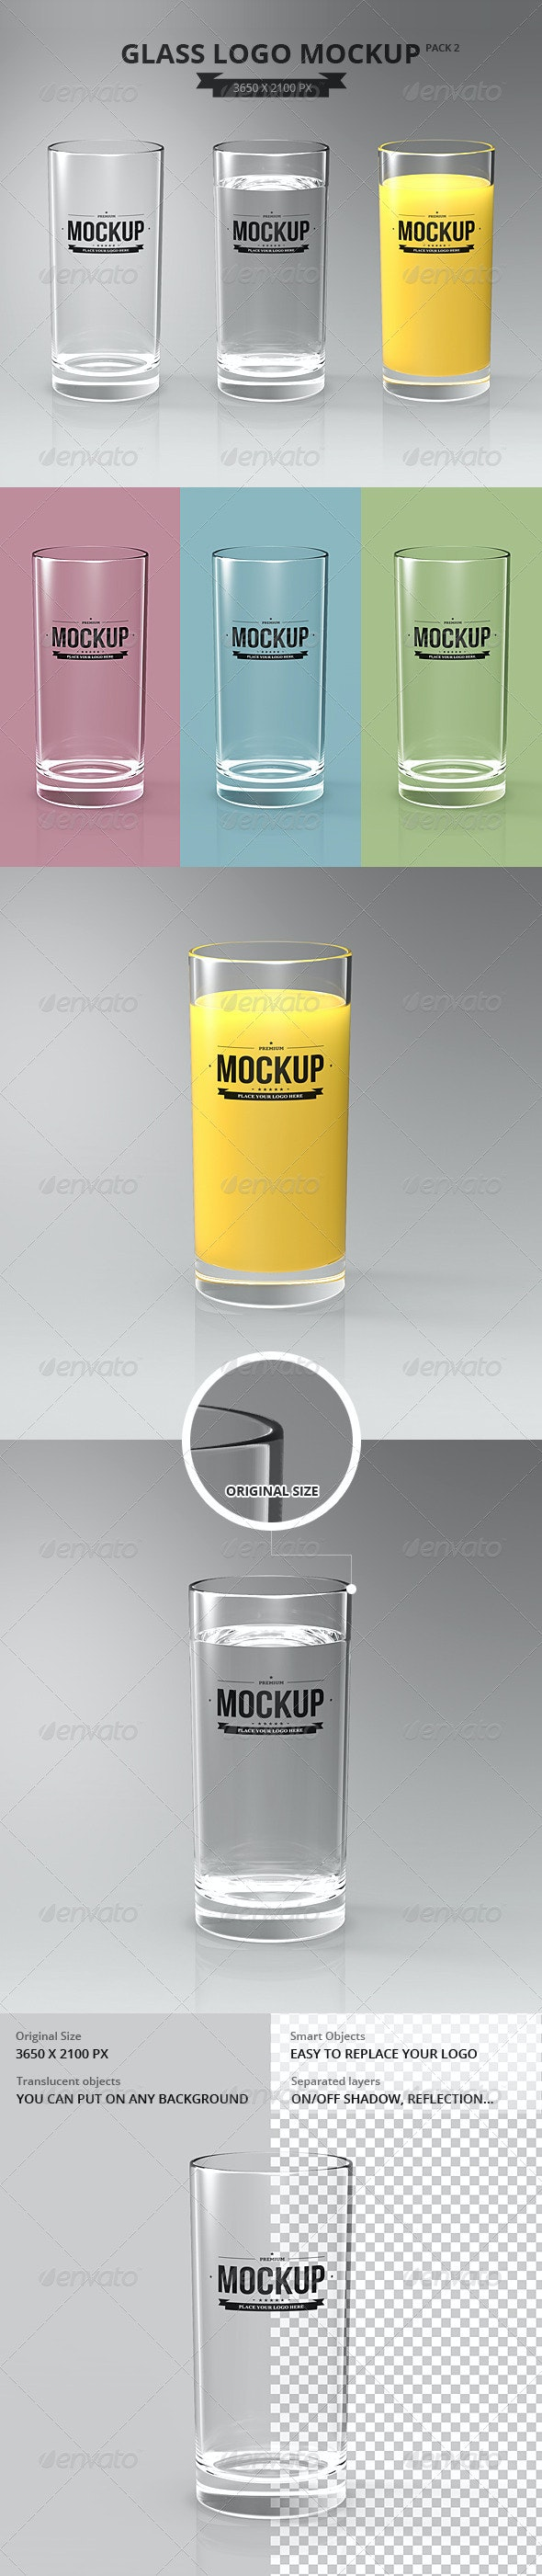 Glasses Logo Mockup Pack 2 - Food and Drink Packaging